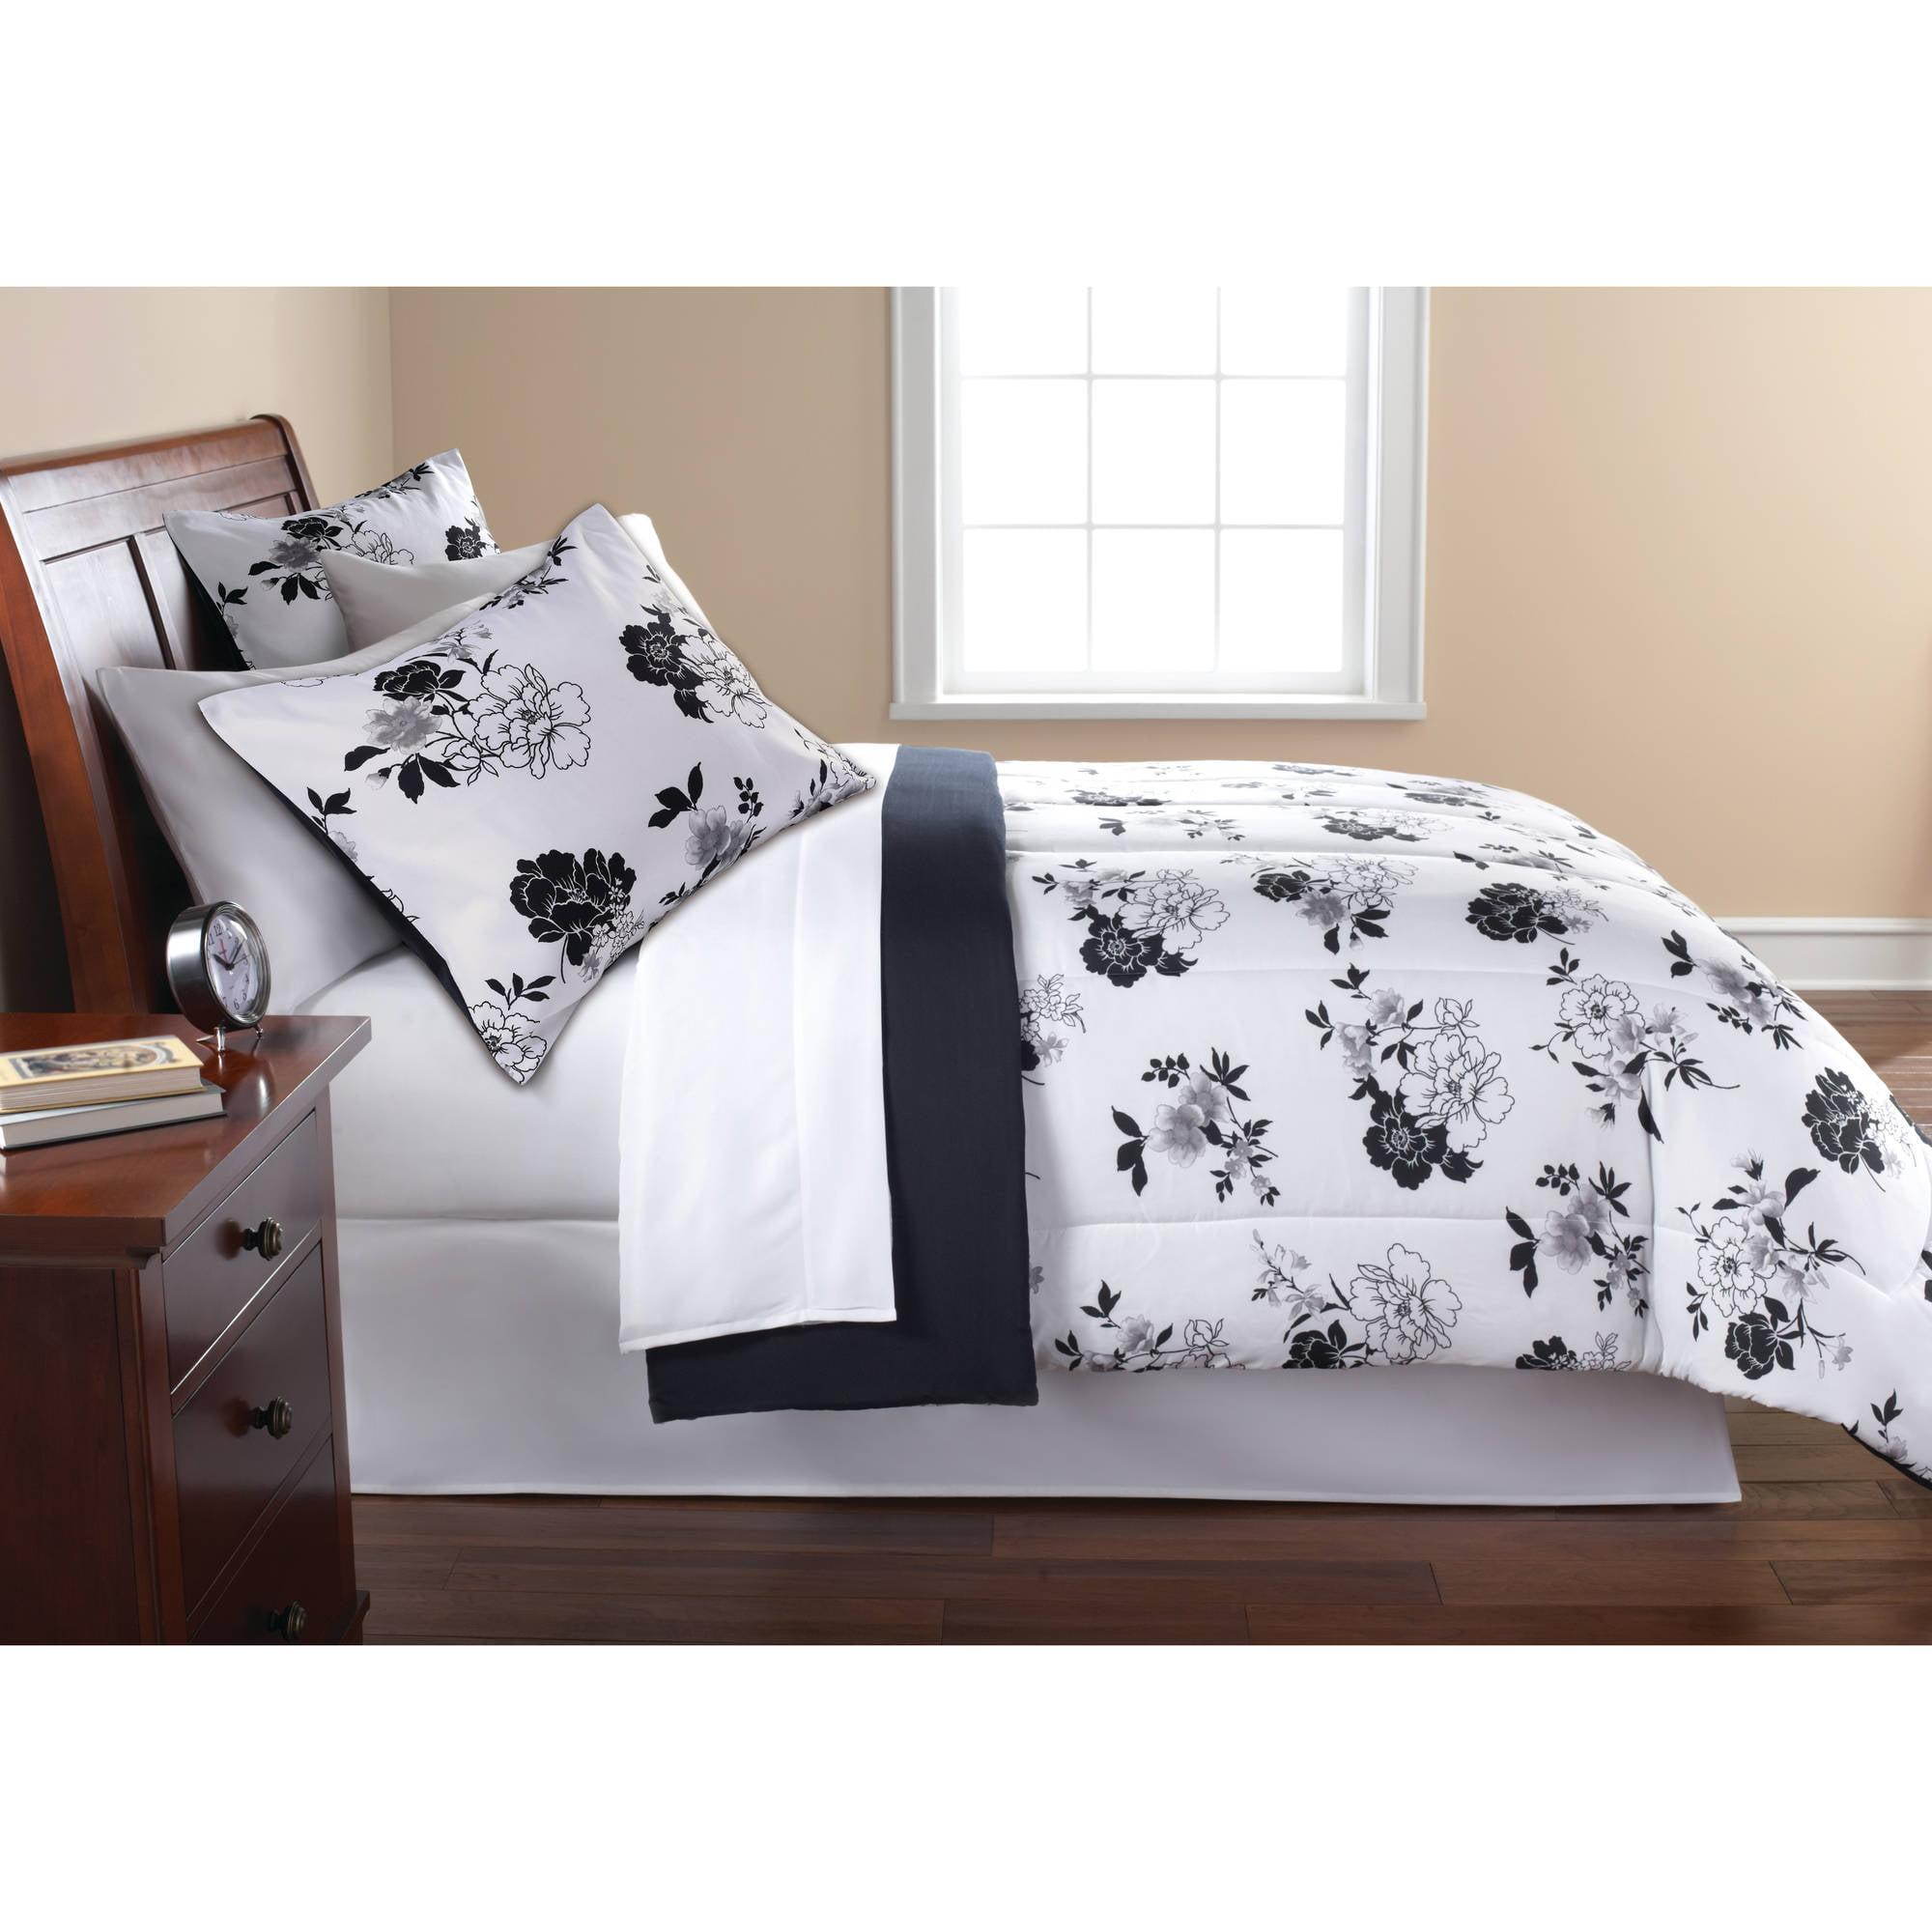 Mainstays Black White Fl Bed In A Bag Complete Bedding Set